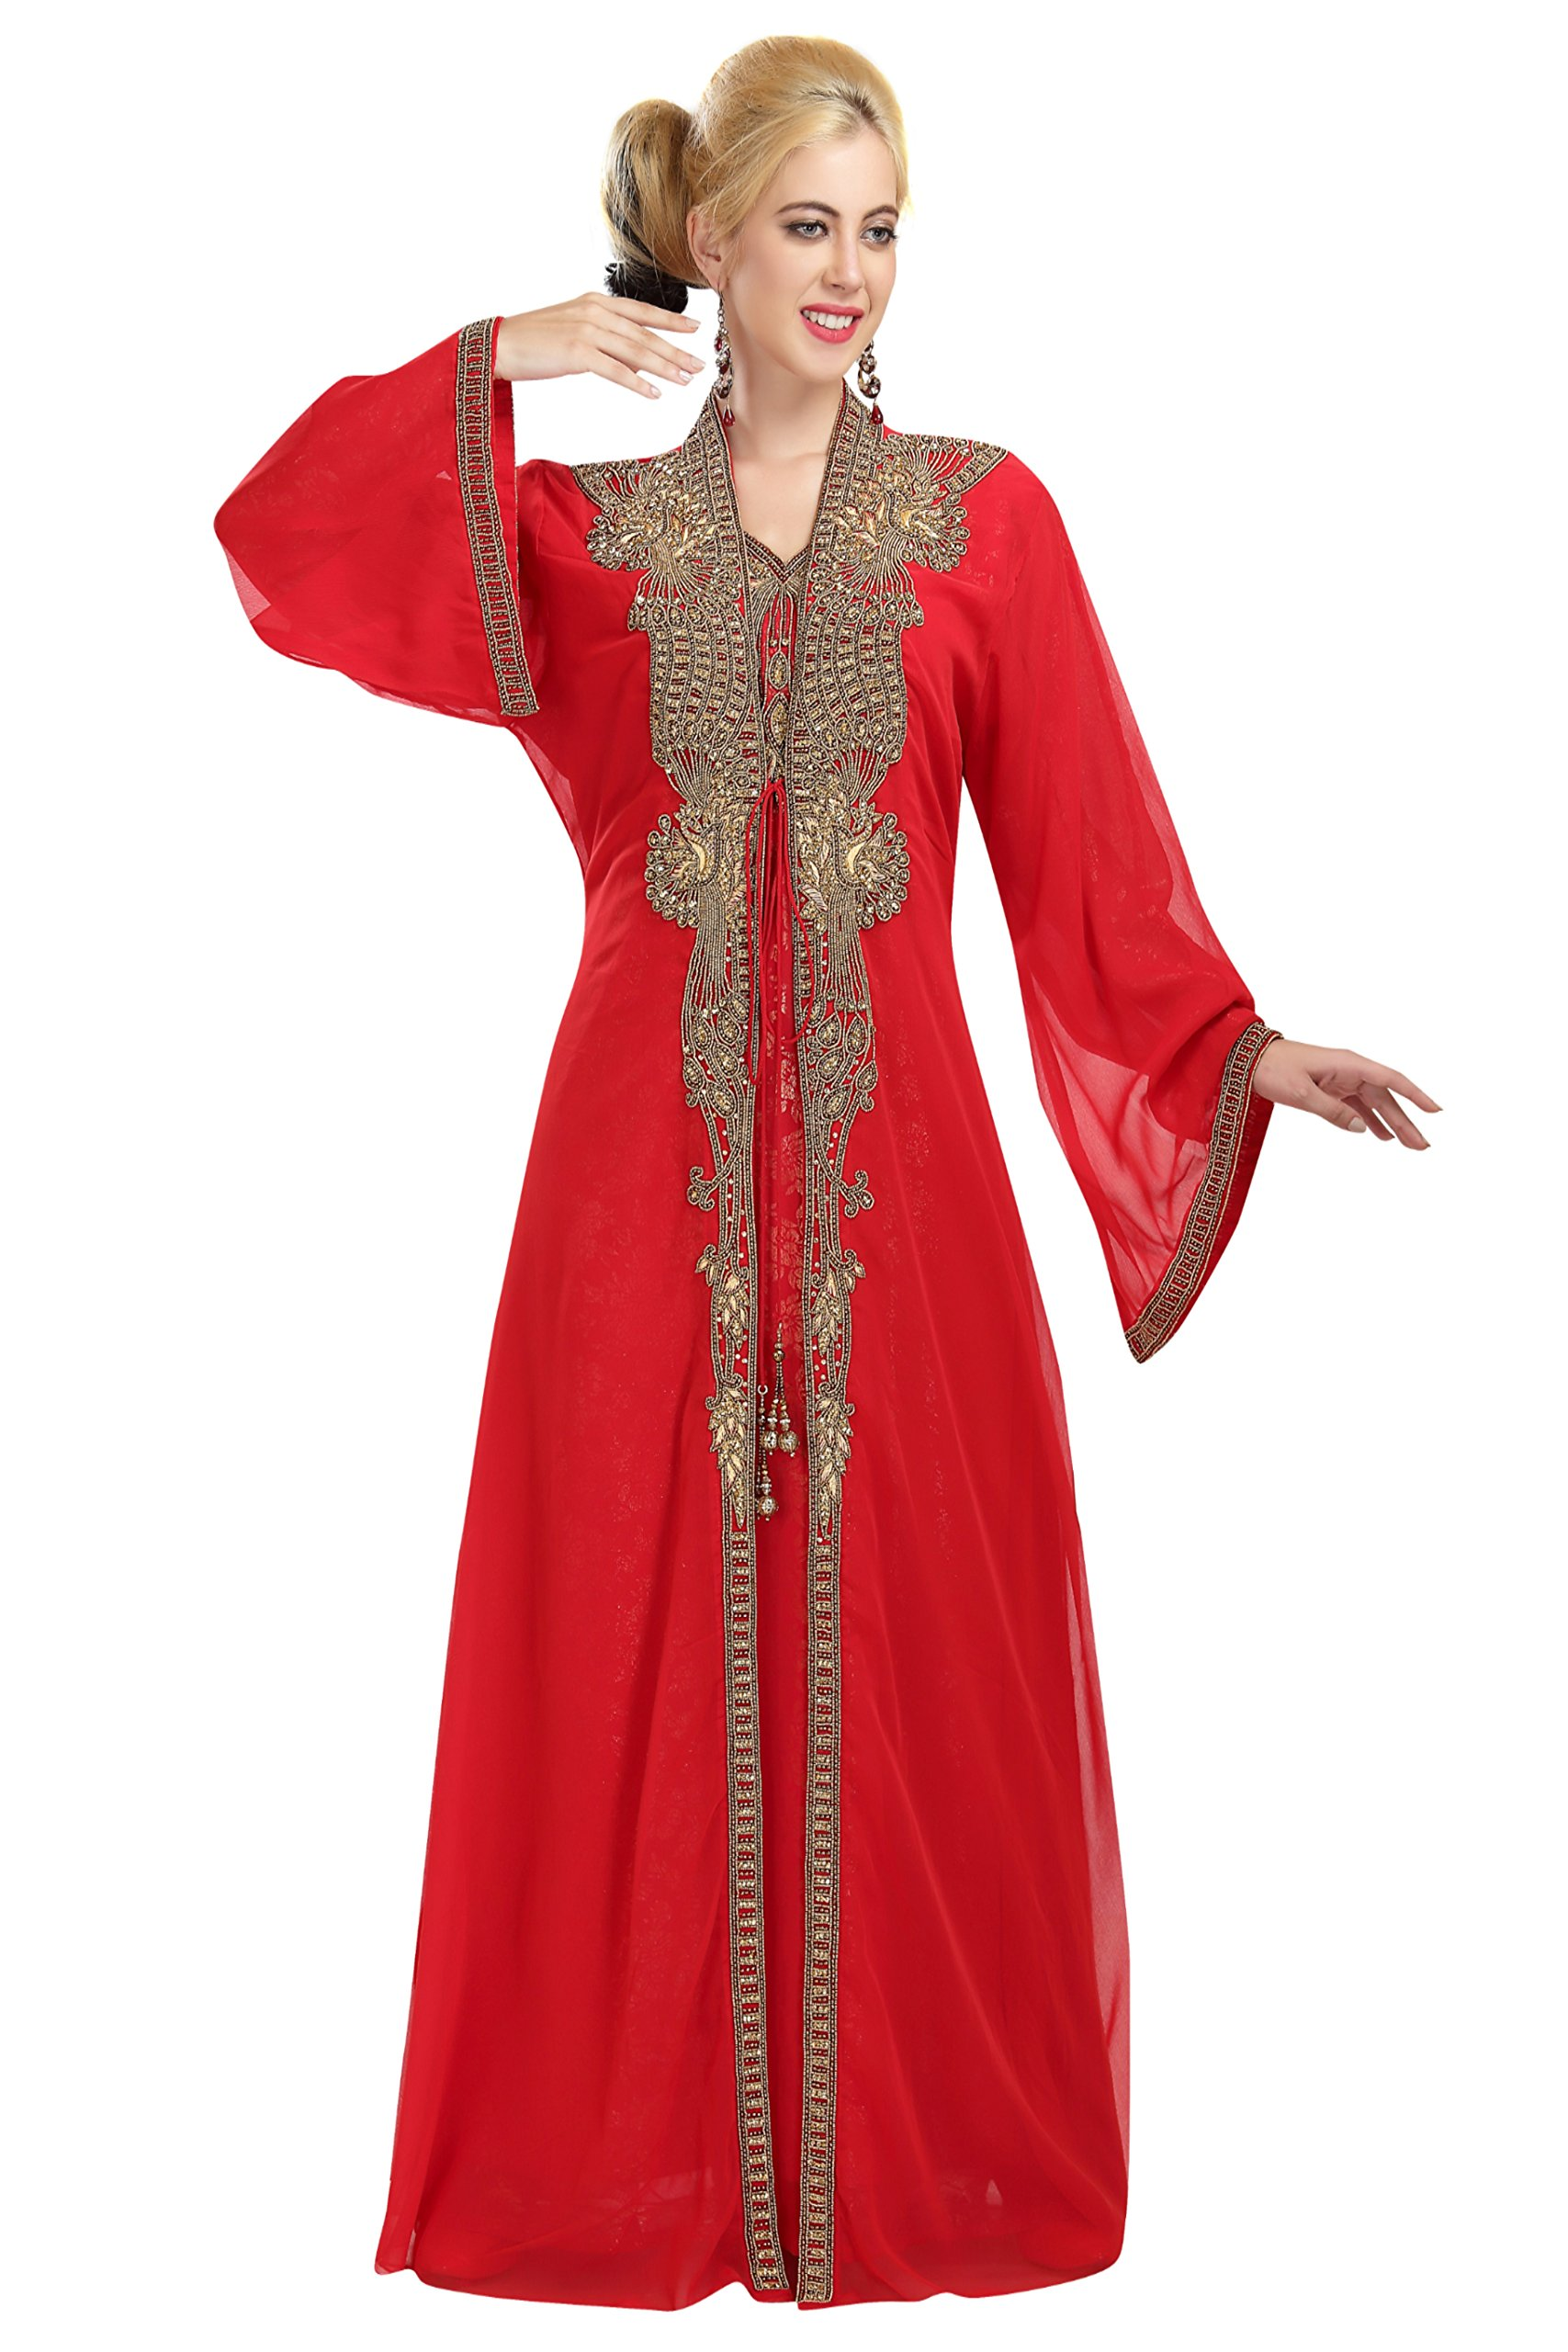 Beautiful Customized Party Wear Khaleeji Kaftan for Special Functions 5873 (S)